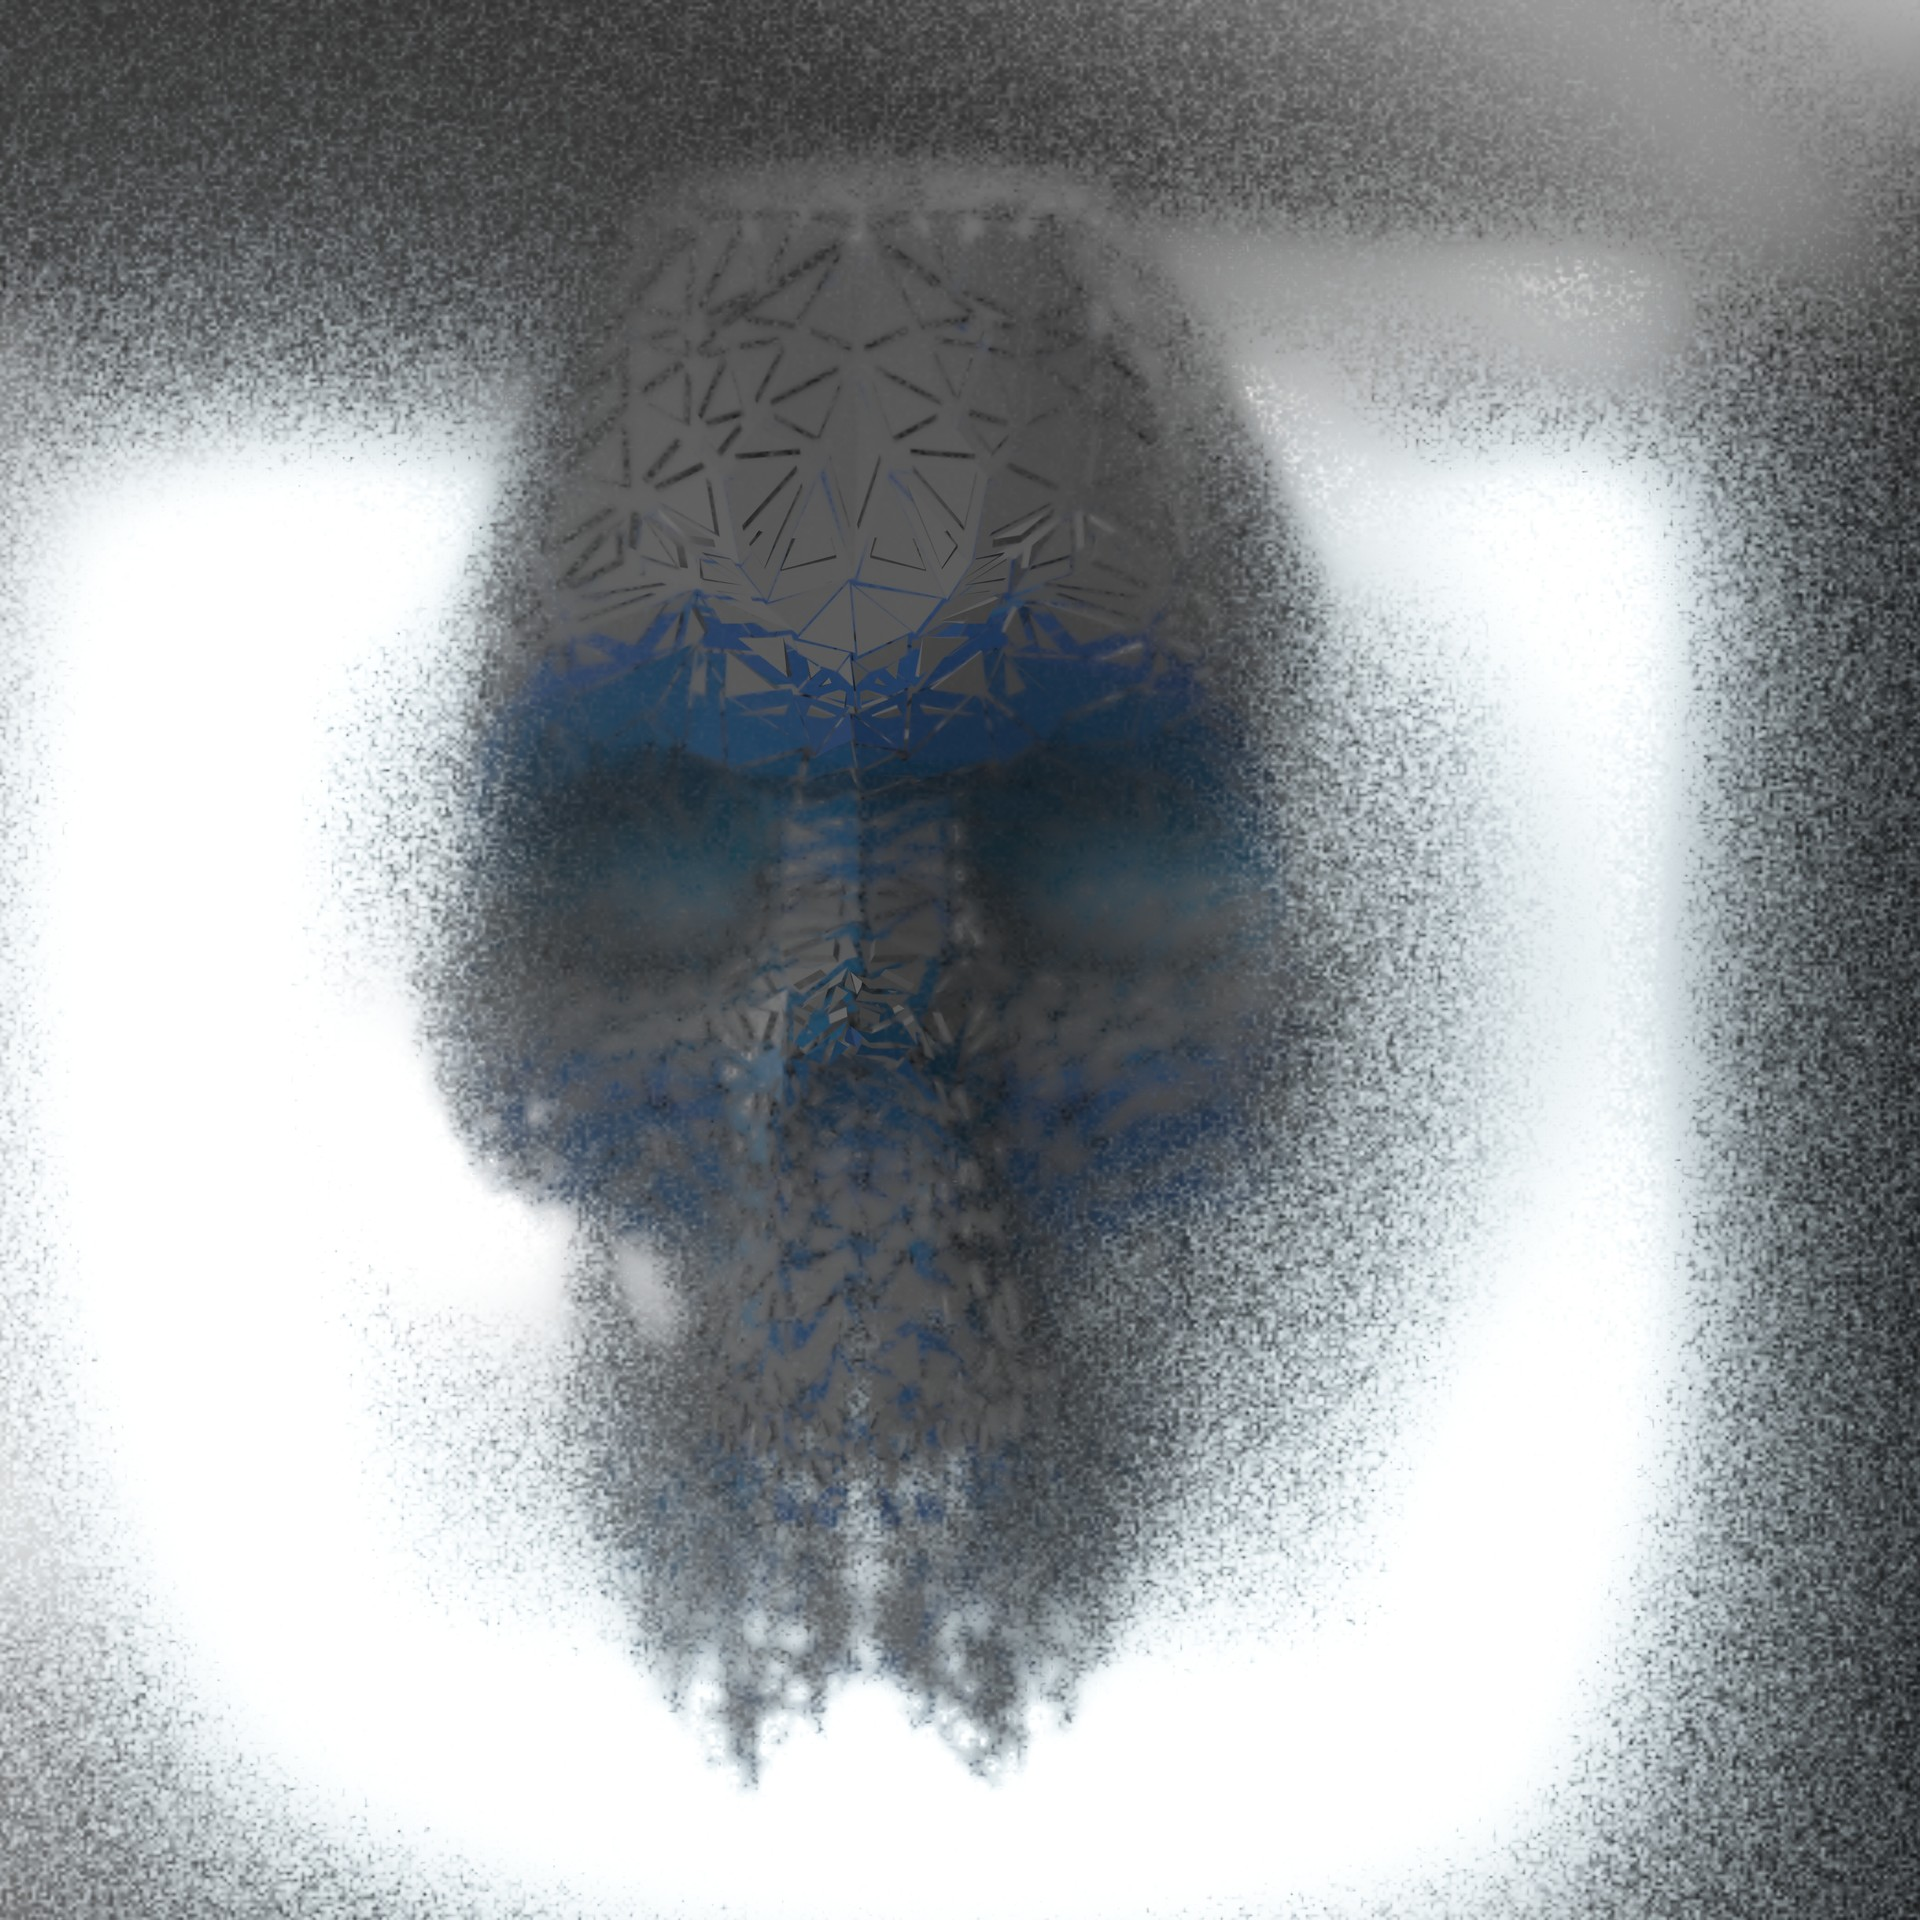 Kresimir jelusic robob3ar 369 161016 skl 16 v2017 whie